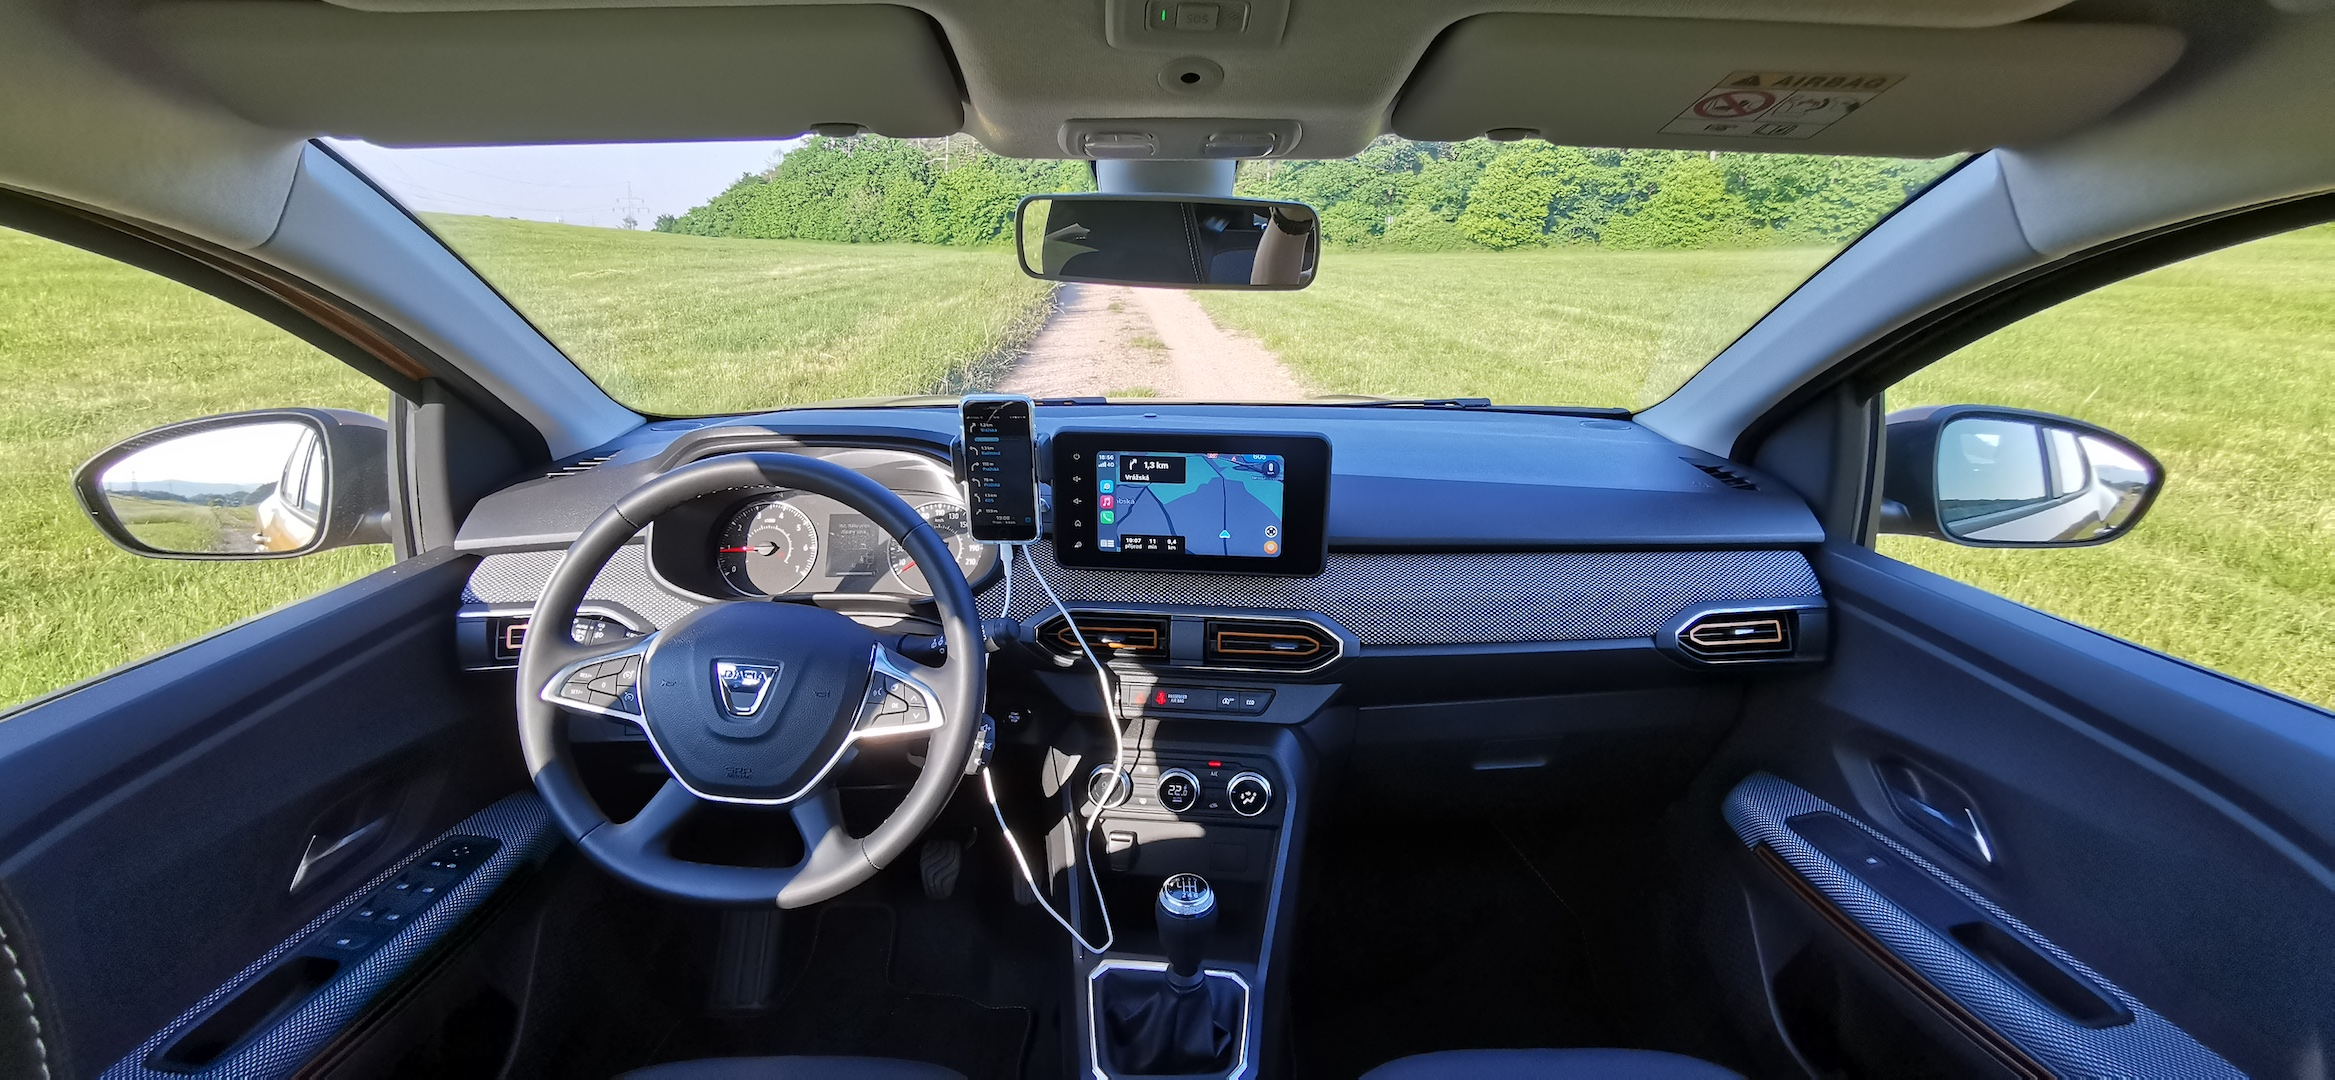 Dacia Sandero Stepway 1,0 TCe LPG - interiér